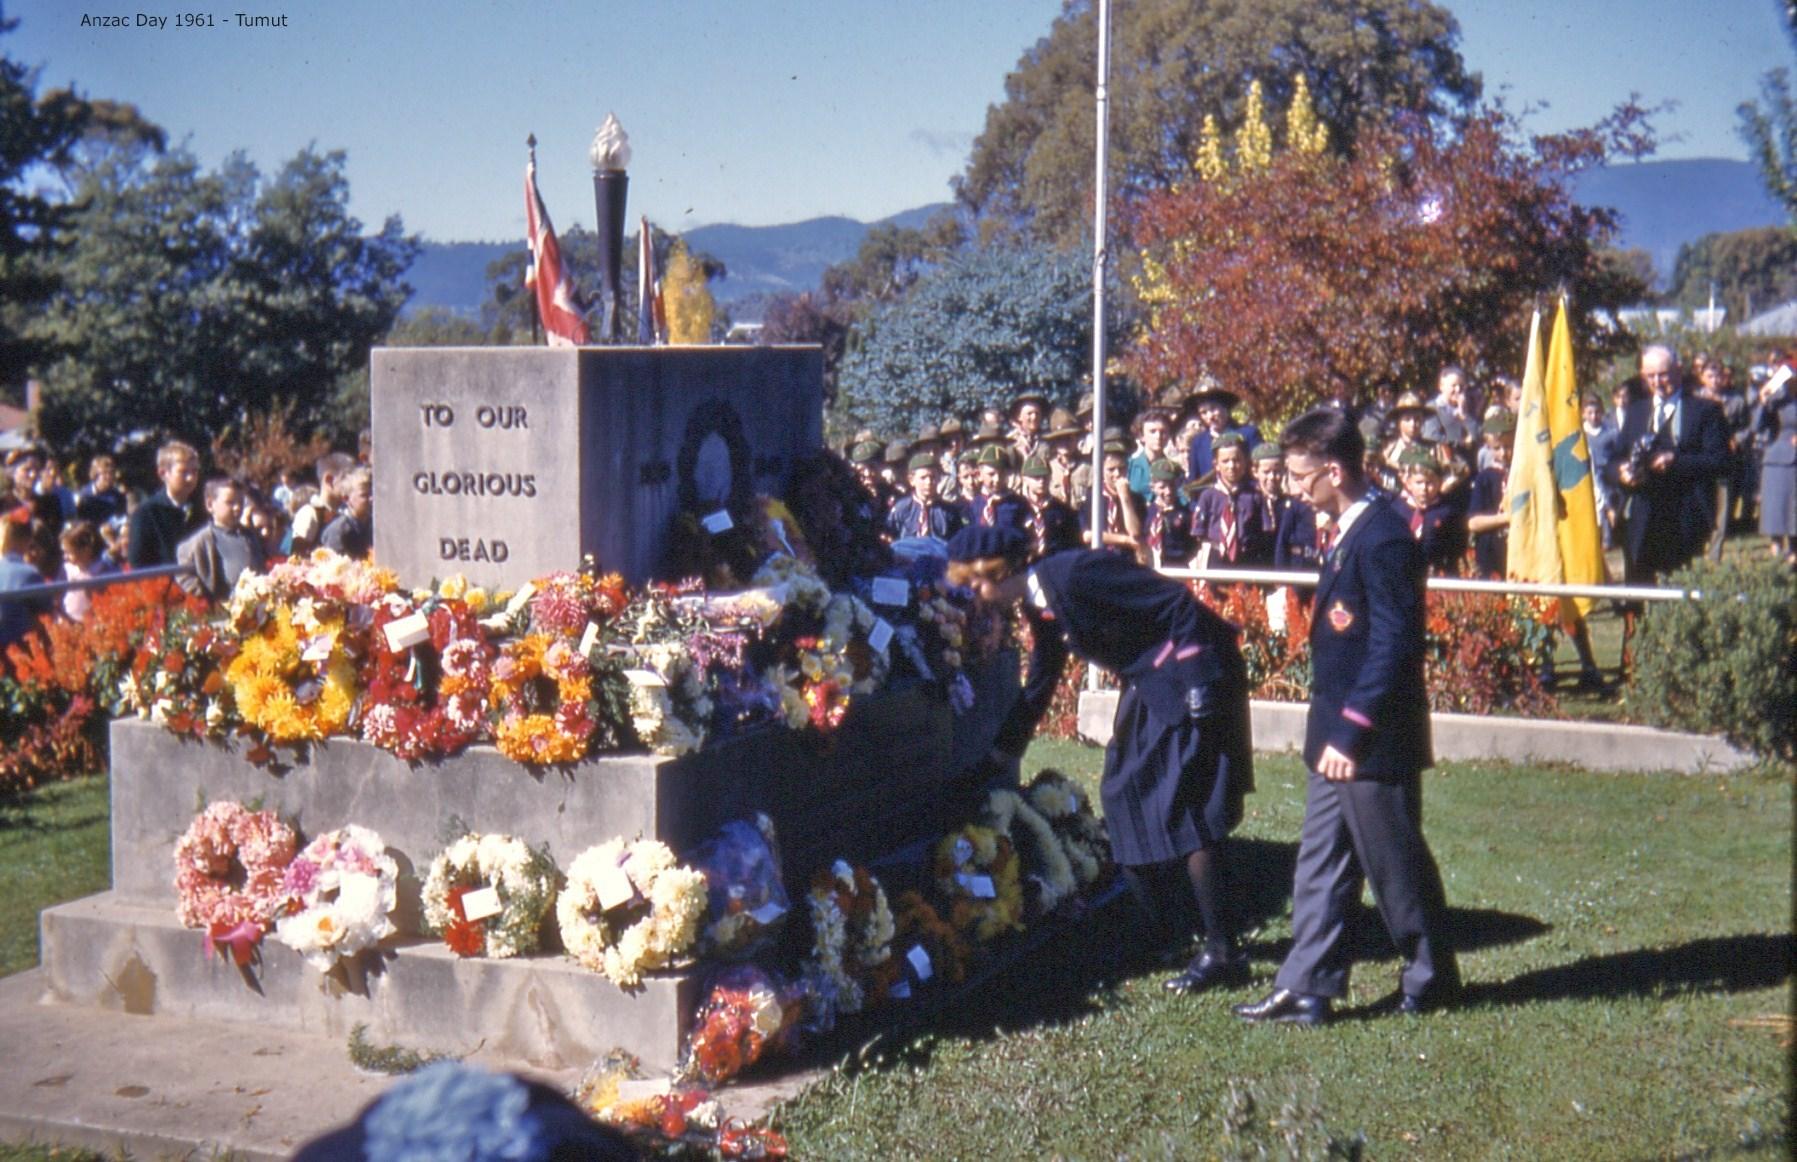 ChrisBonnorANZAC Day2 1961